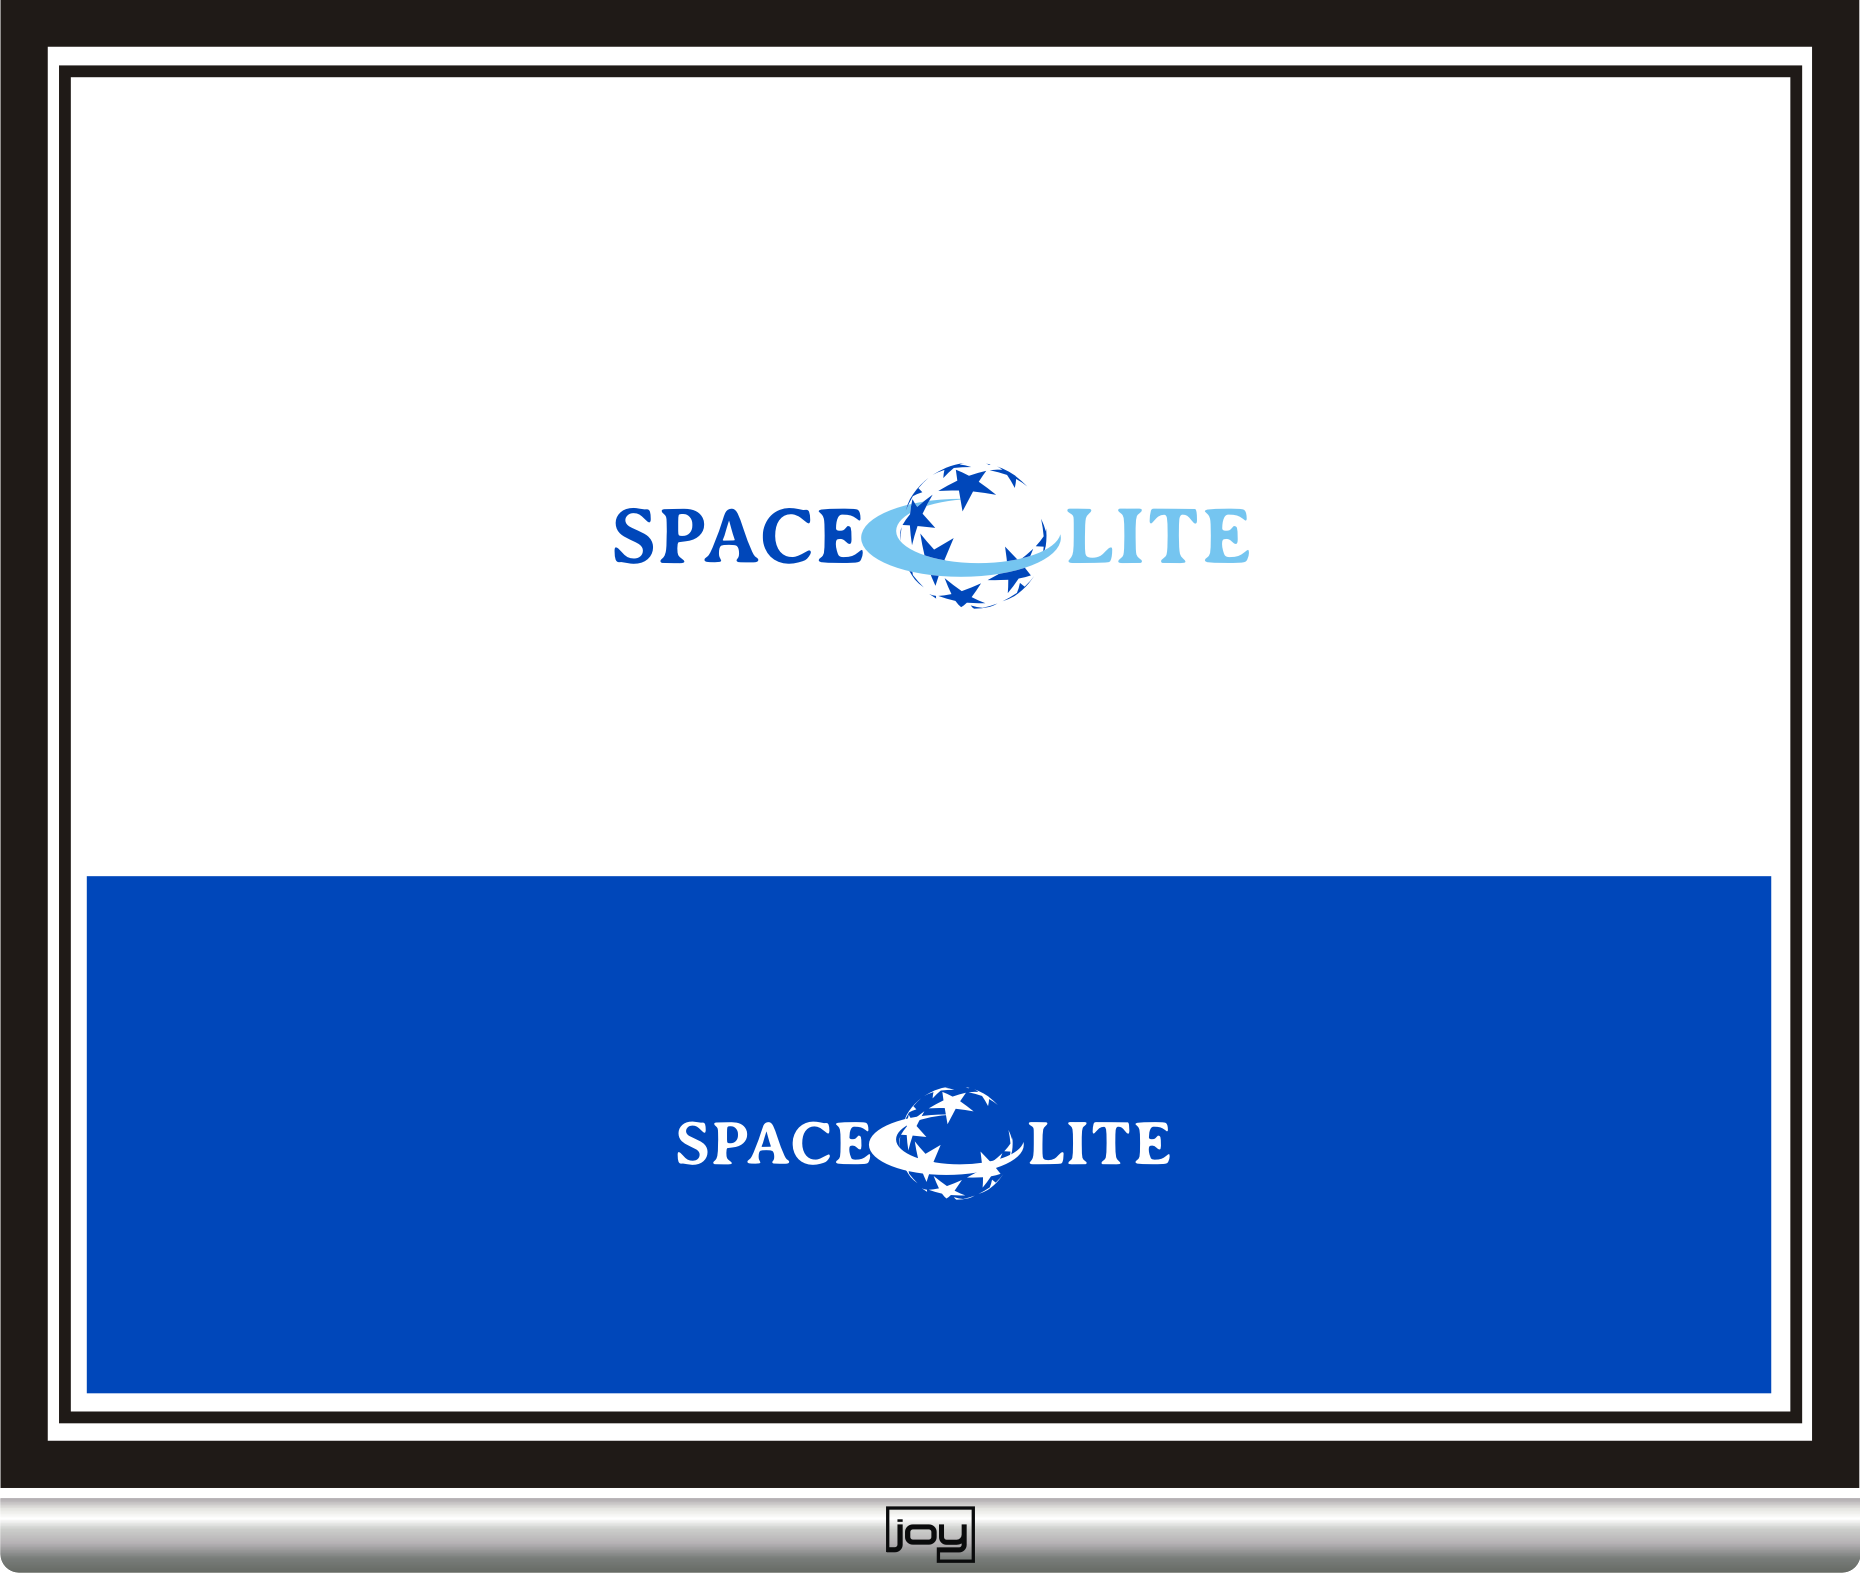 Logo Design by joysetiawan - Entry No. 39 in the Logo Design Contest Fun Logo Design for Spacelyte.